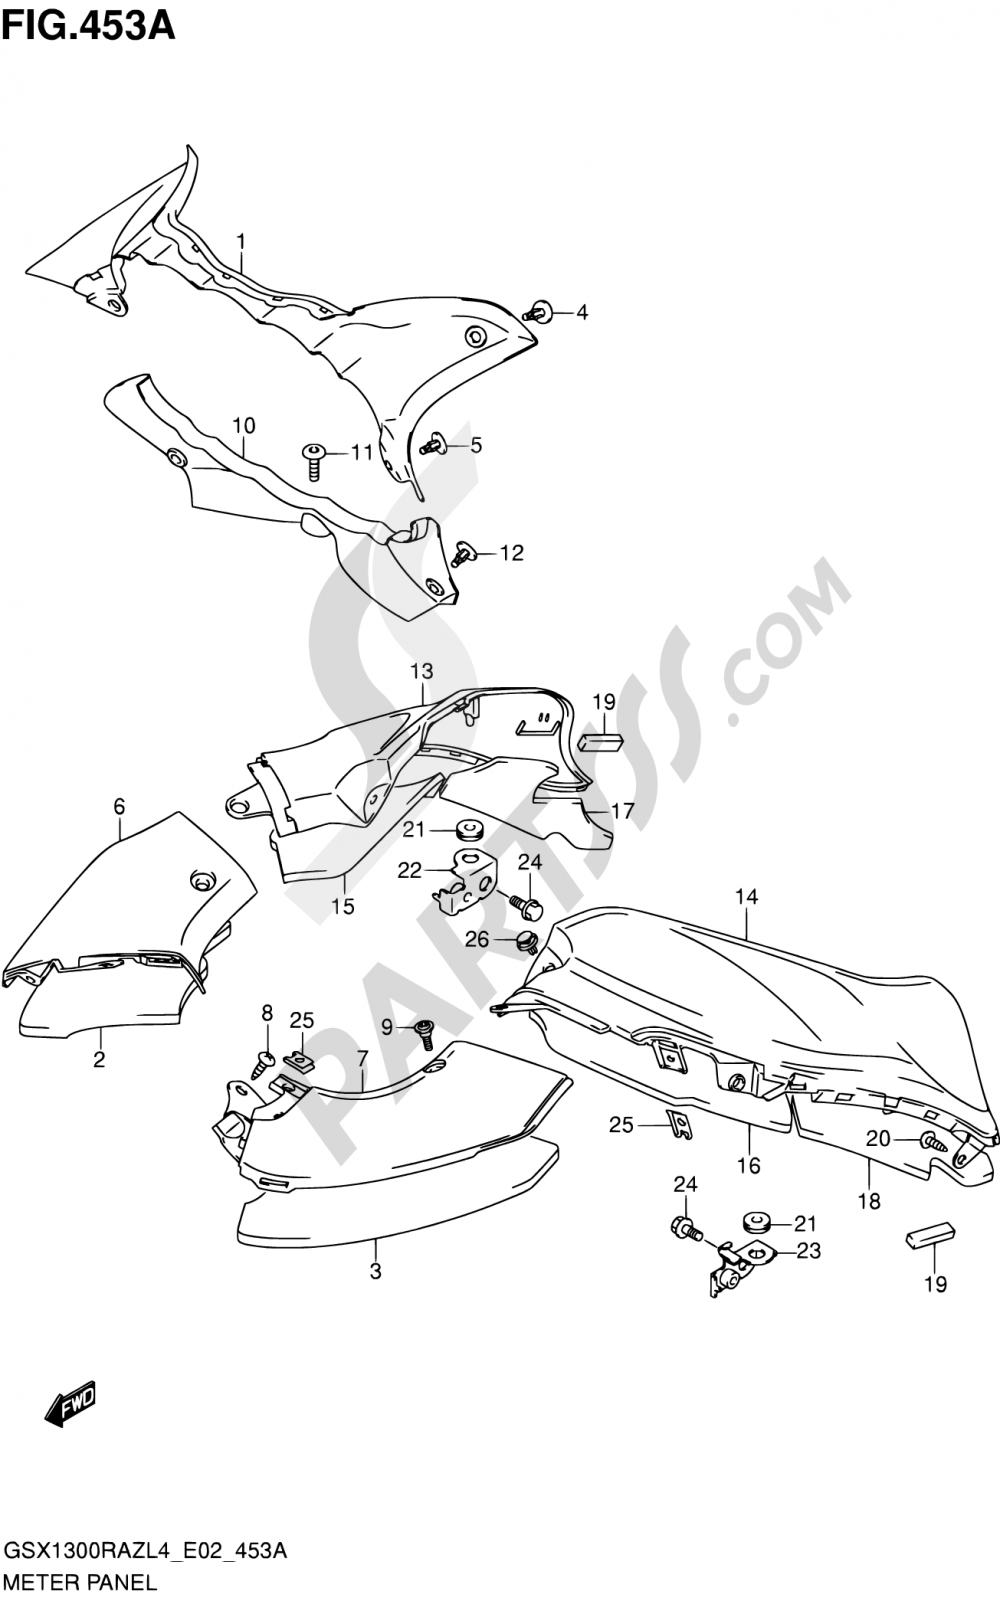 453A - METER PANEL Suzuki HAYABUSA GSX1300RAZ 2014